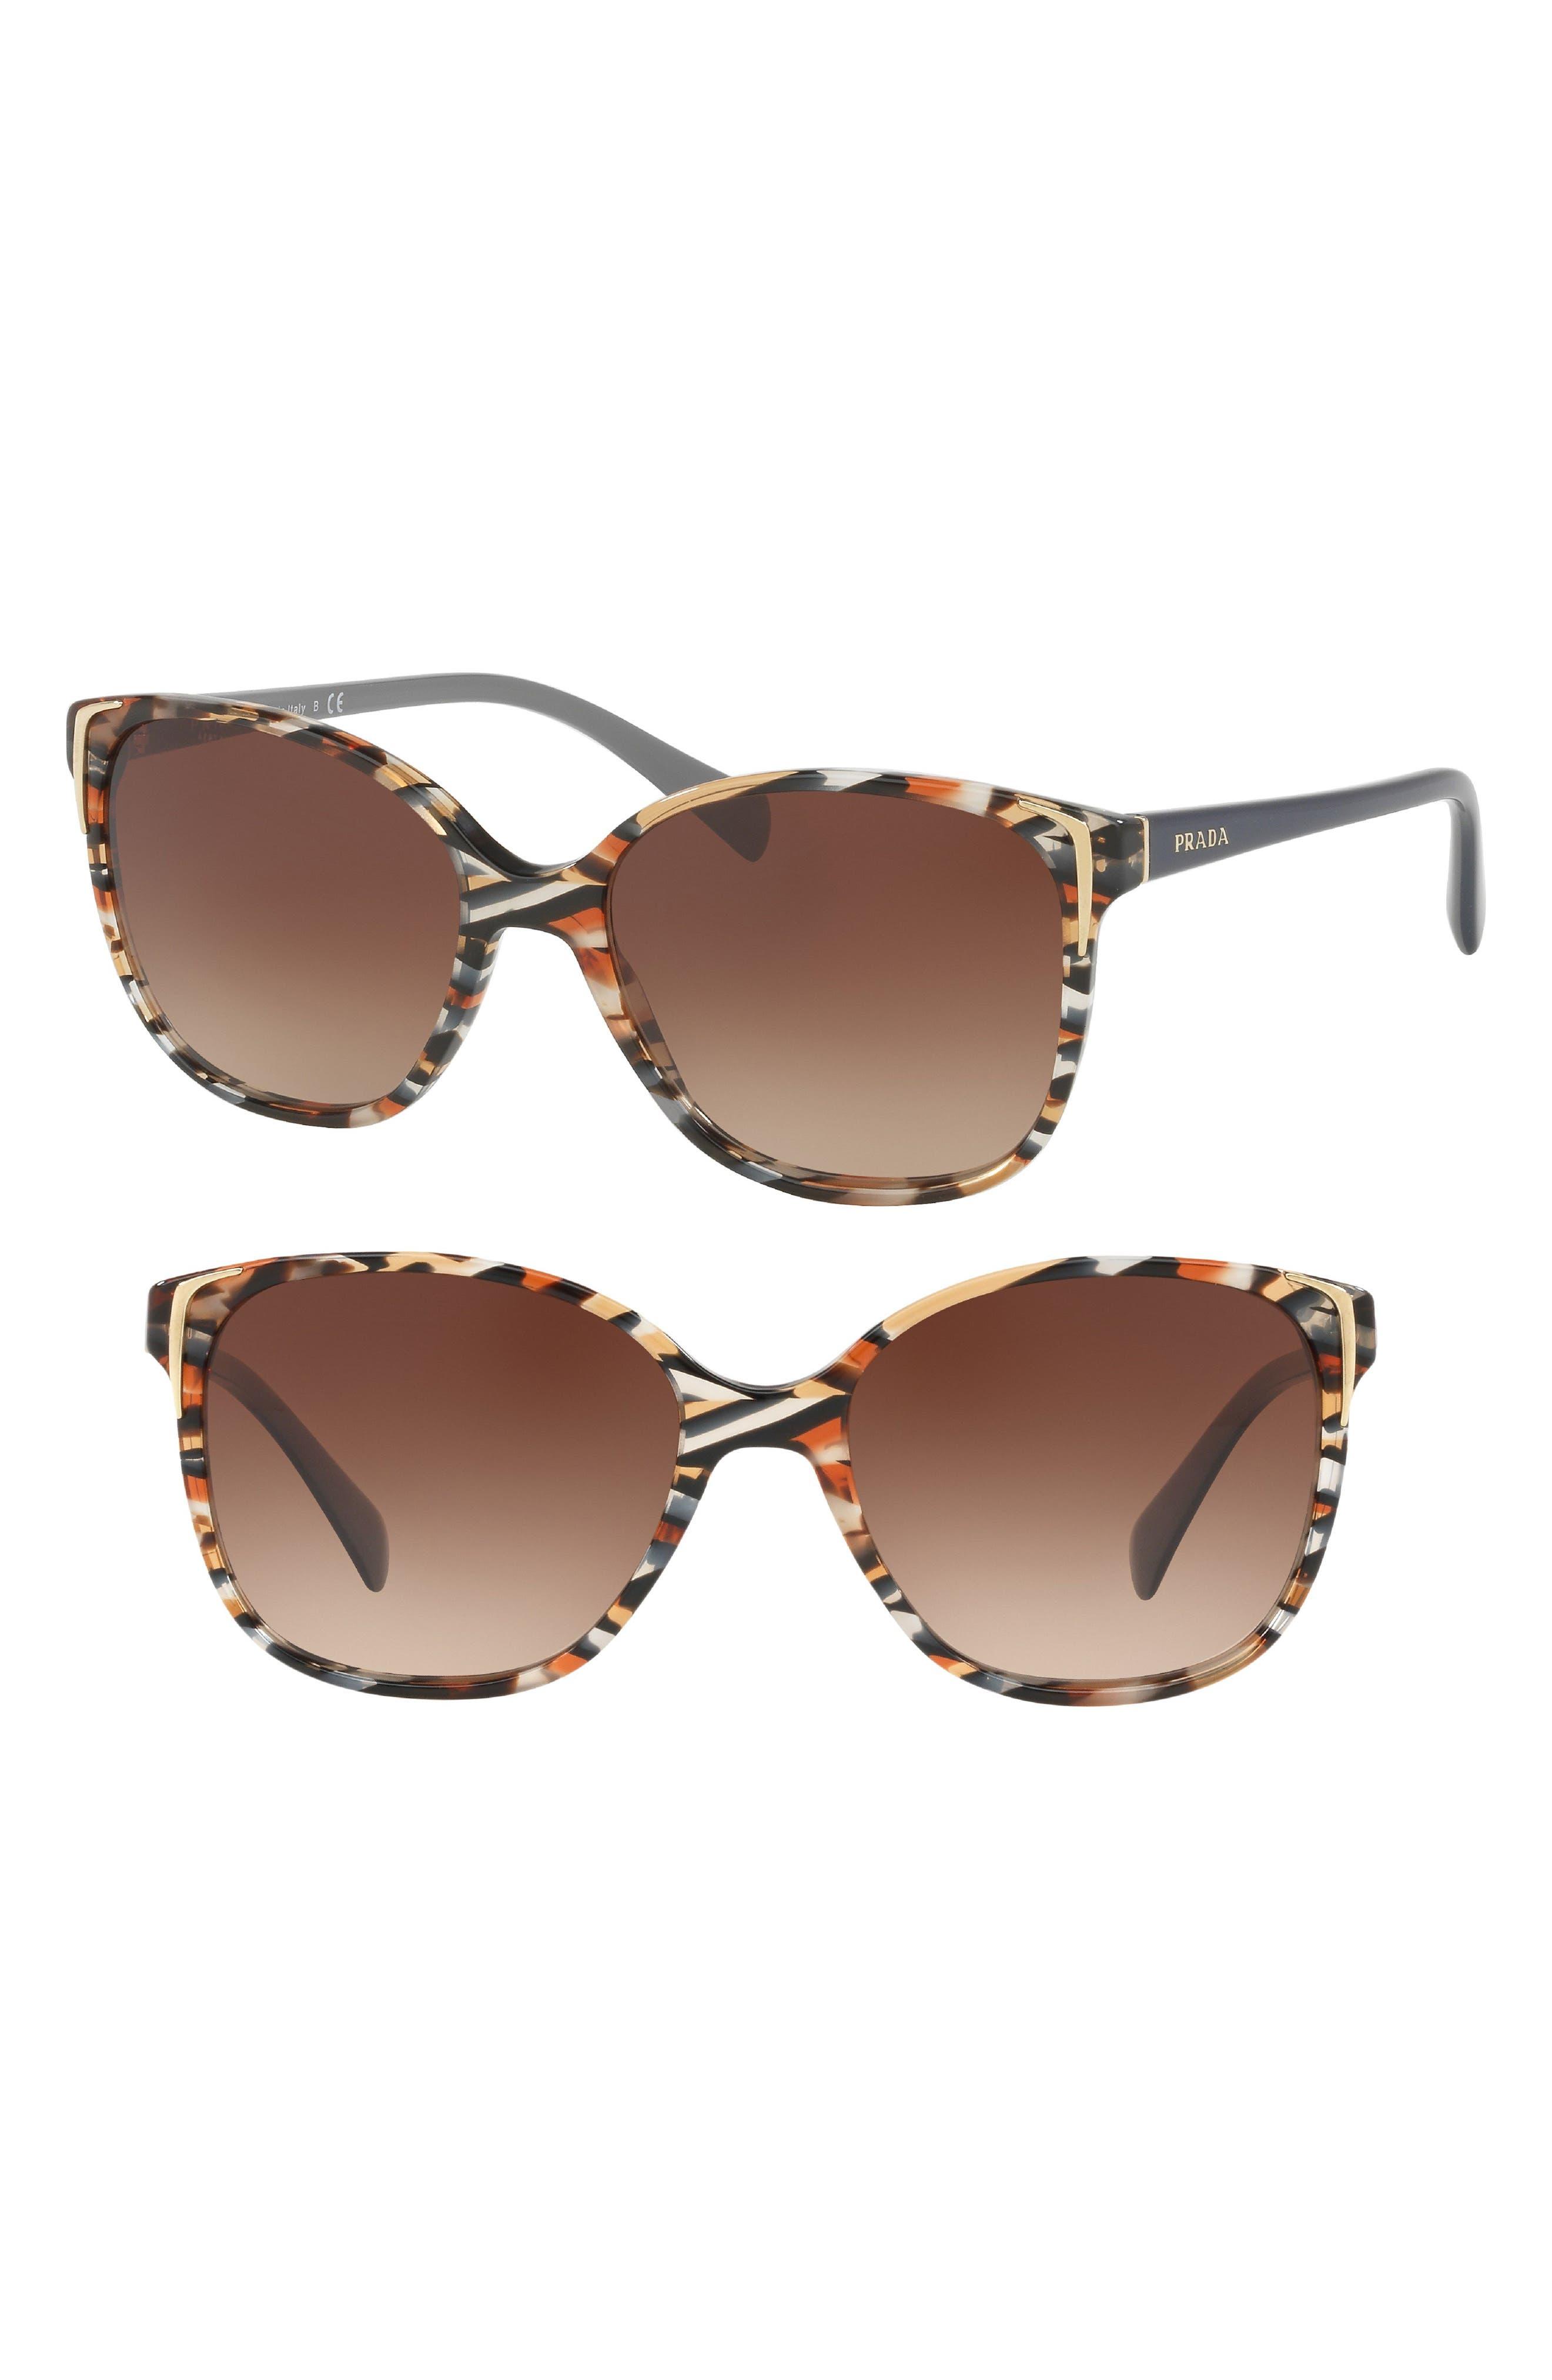 55mm Polarized Cat Eye Sunglasses,                             Alternate thumbnail 2, color,                             HAVANA